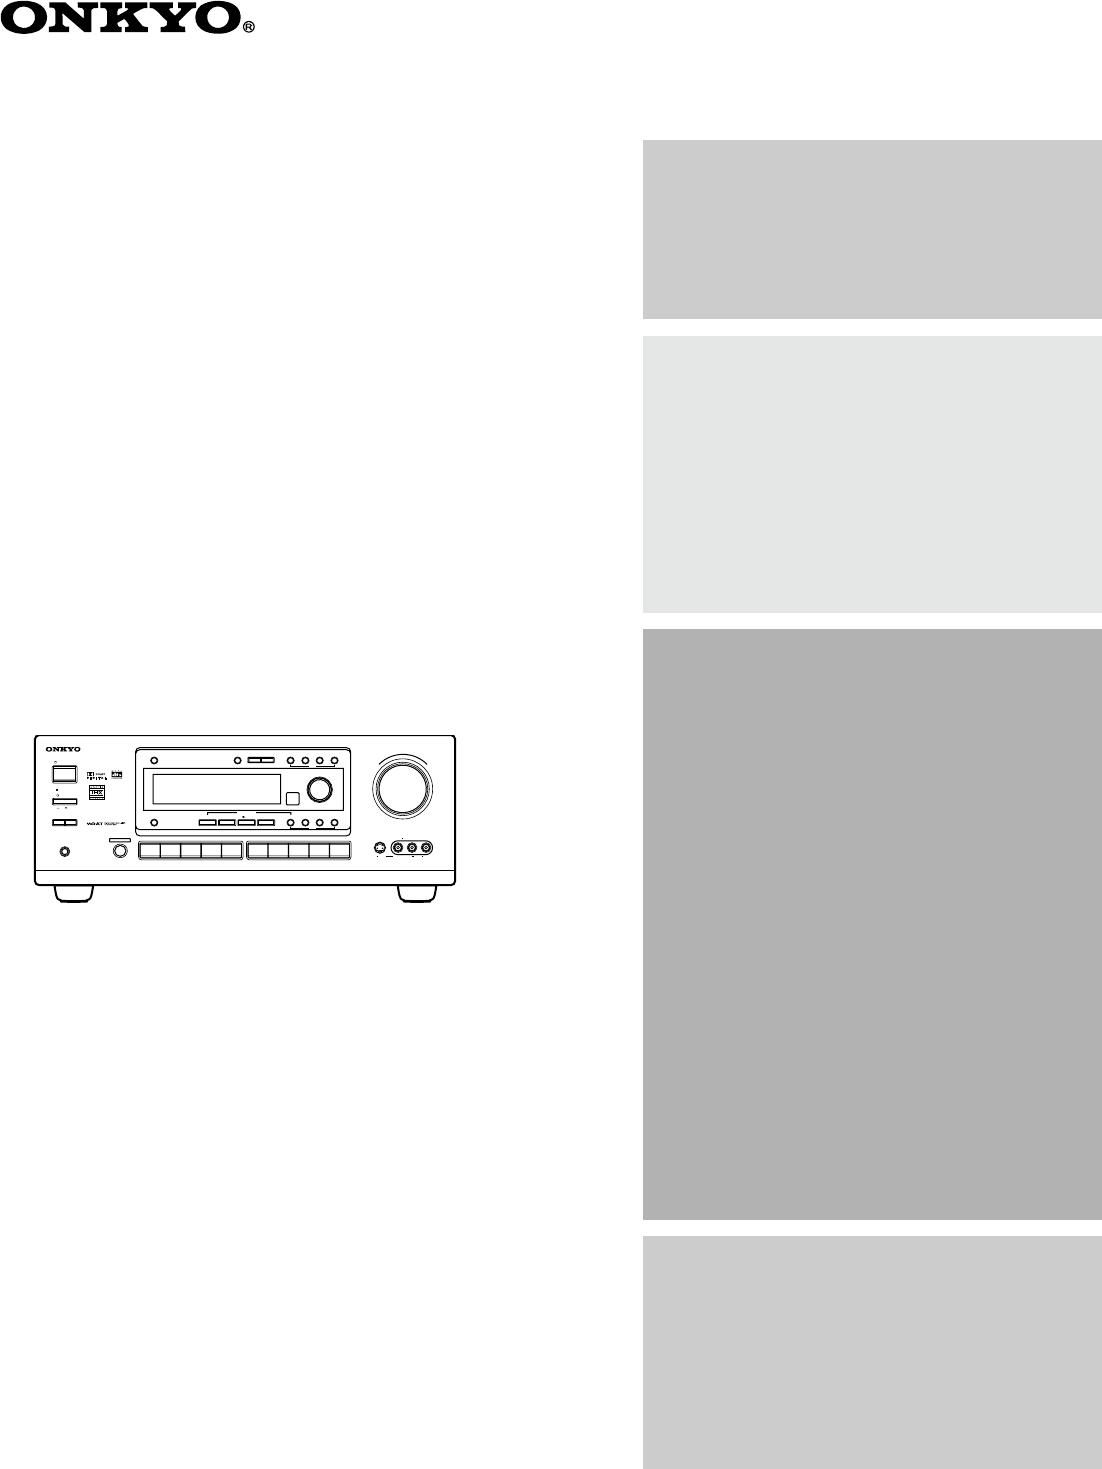 Handleiding Onkyo TX-DS676 (pagina 36 van 64) (English)